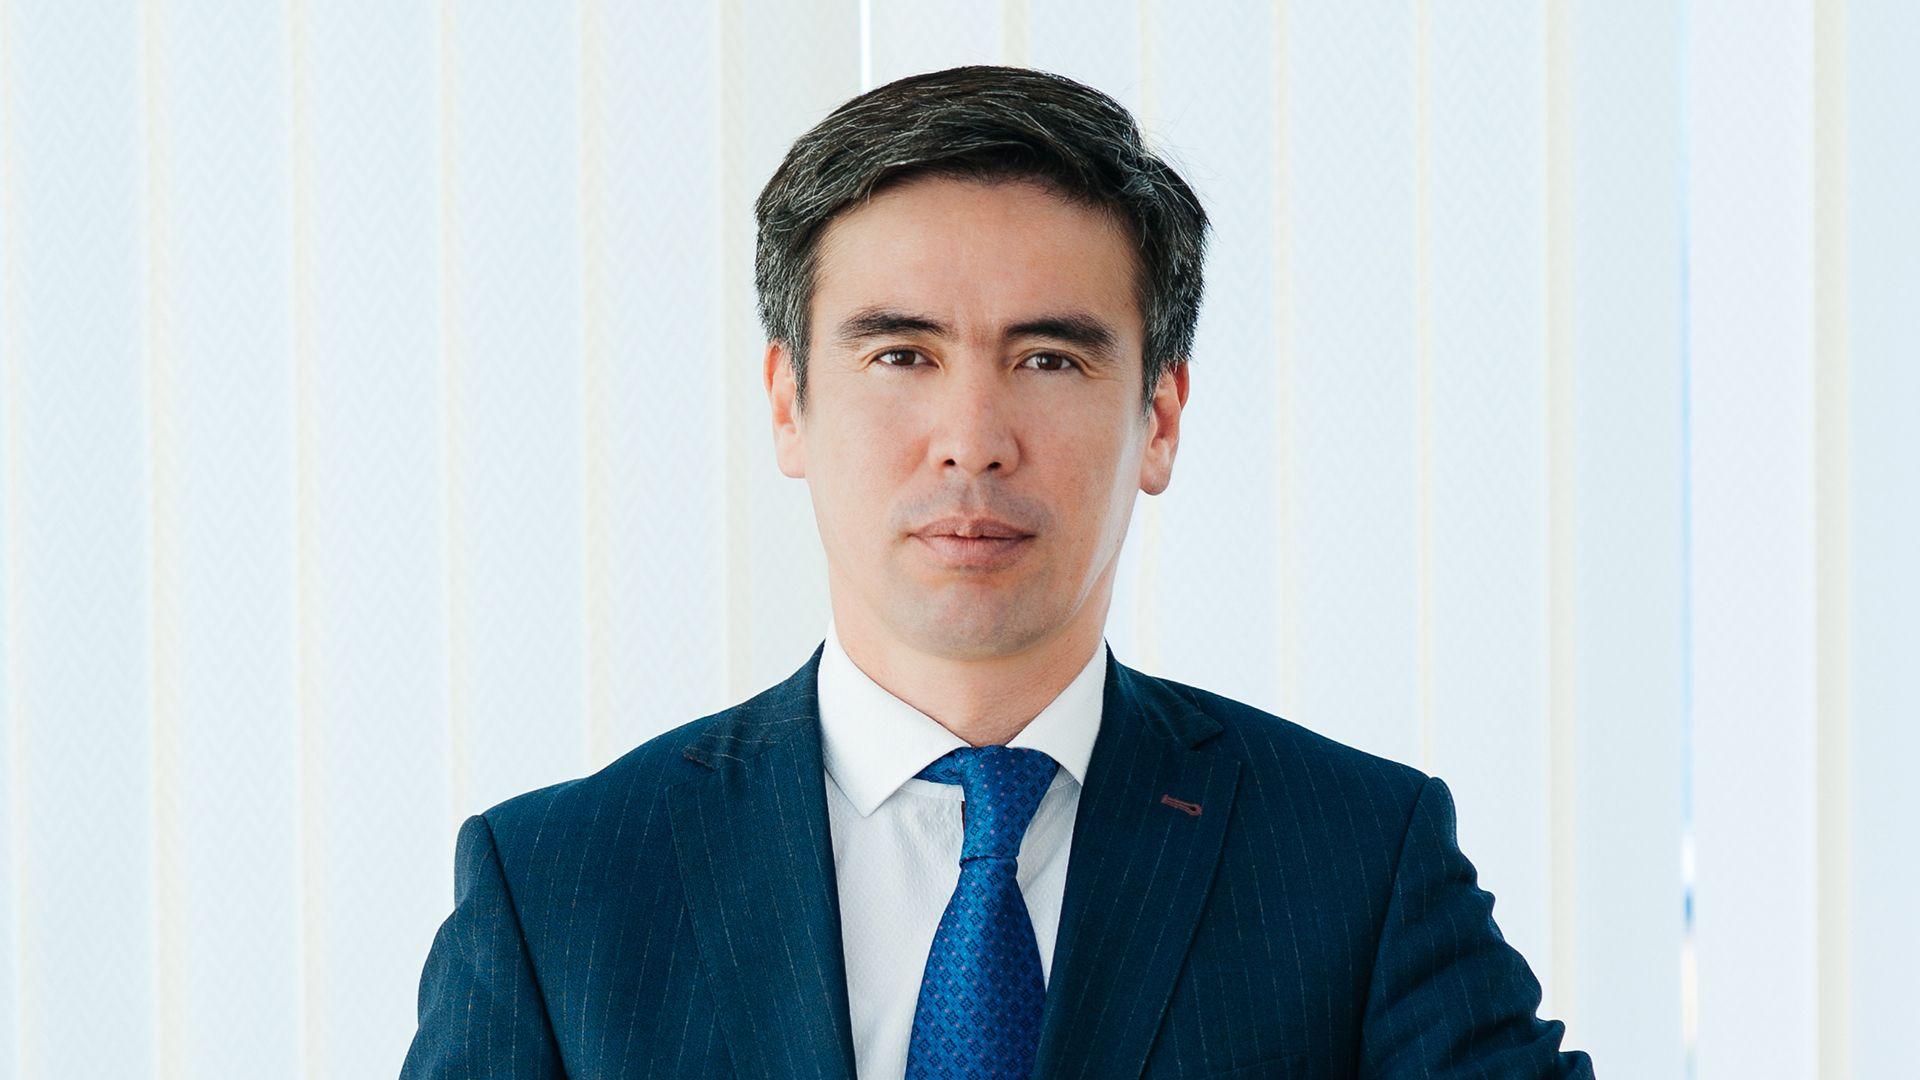 Марат Шоранов стал первым вице-министром здравоохранения 348918 - Kapital.kz